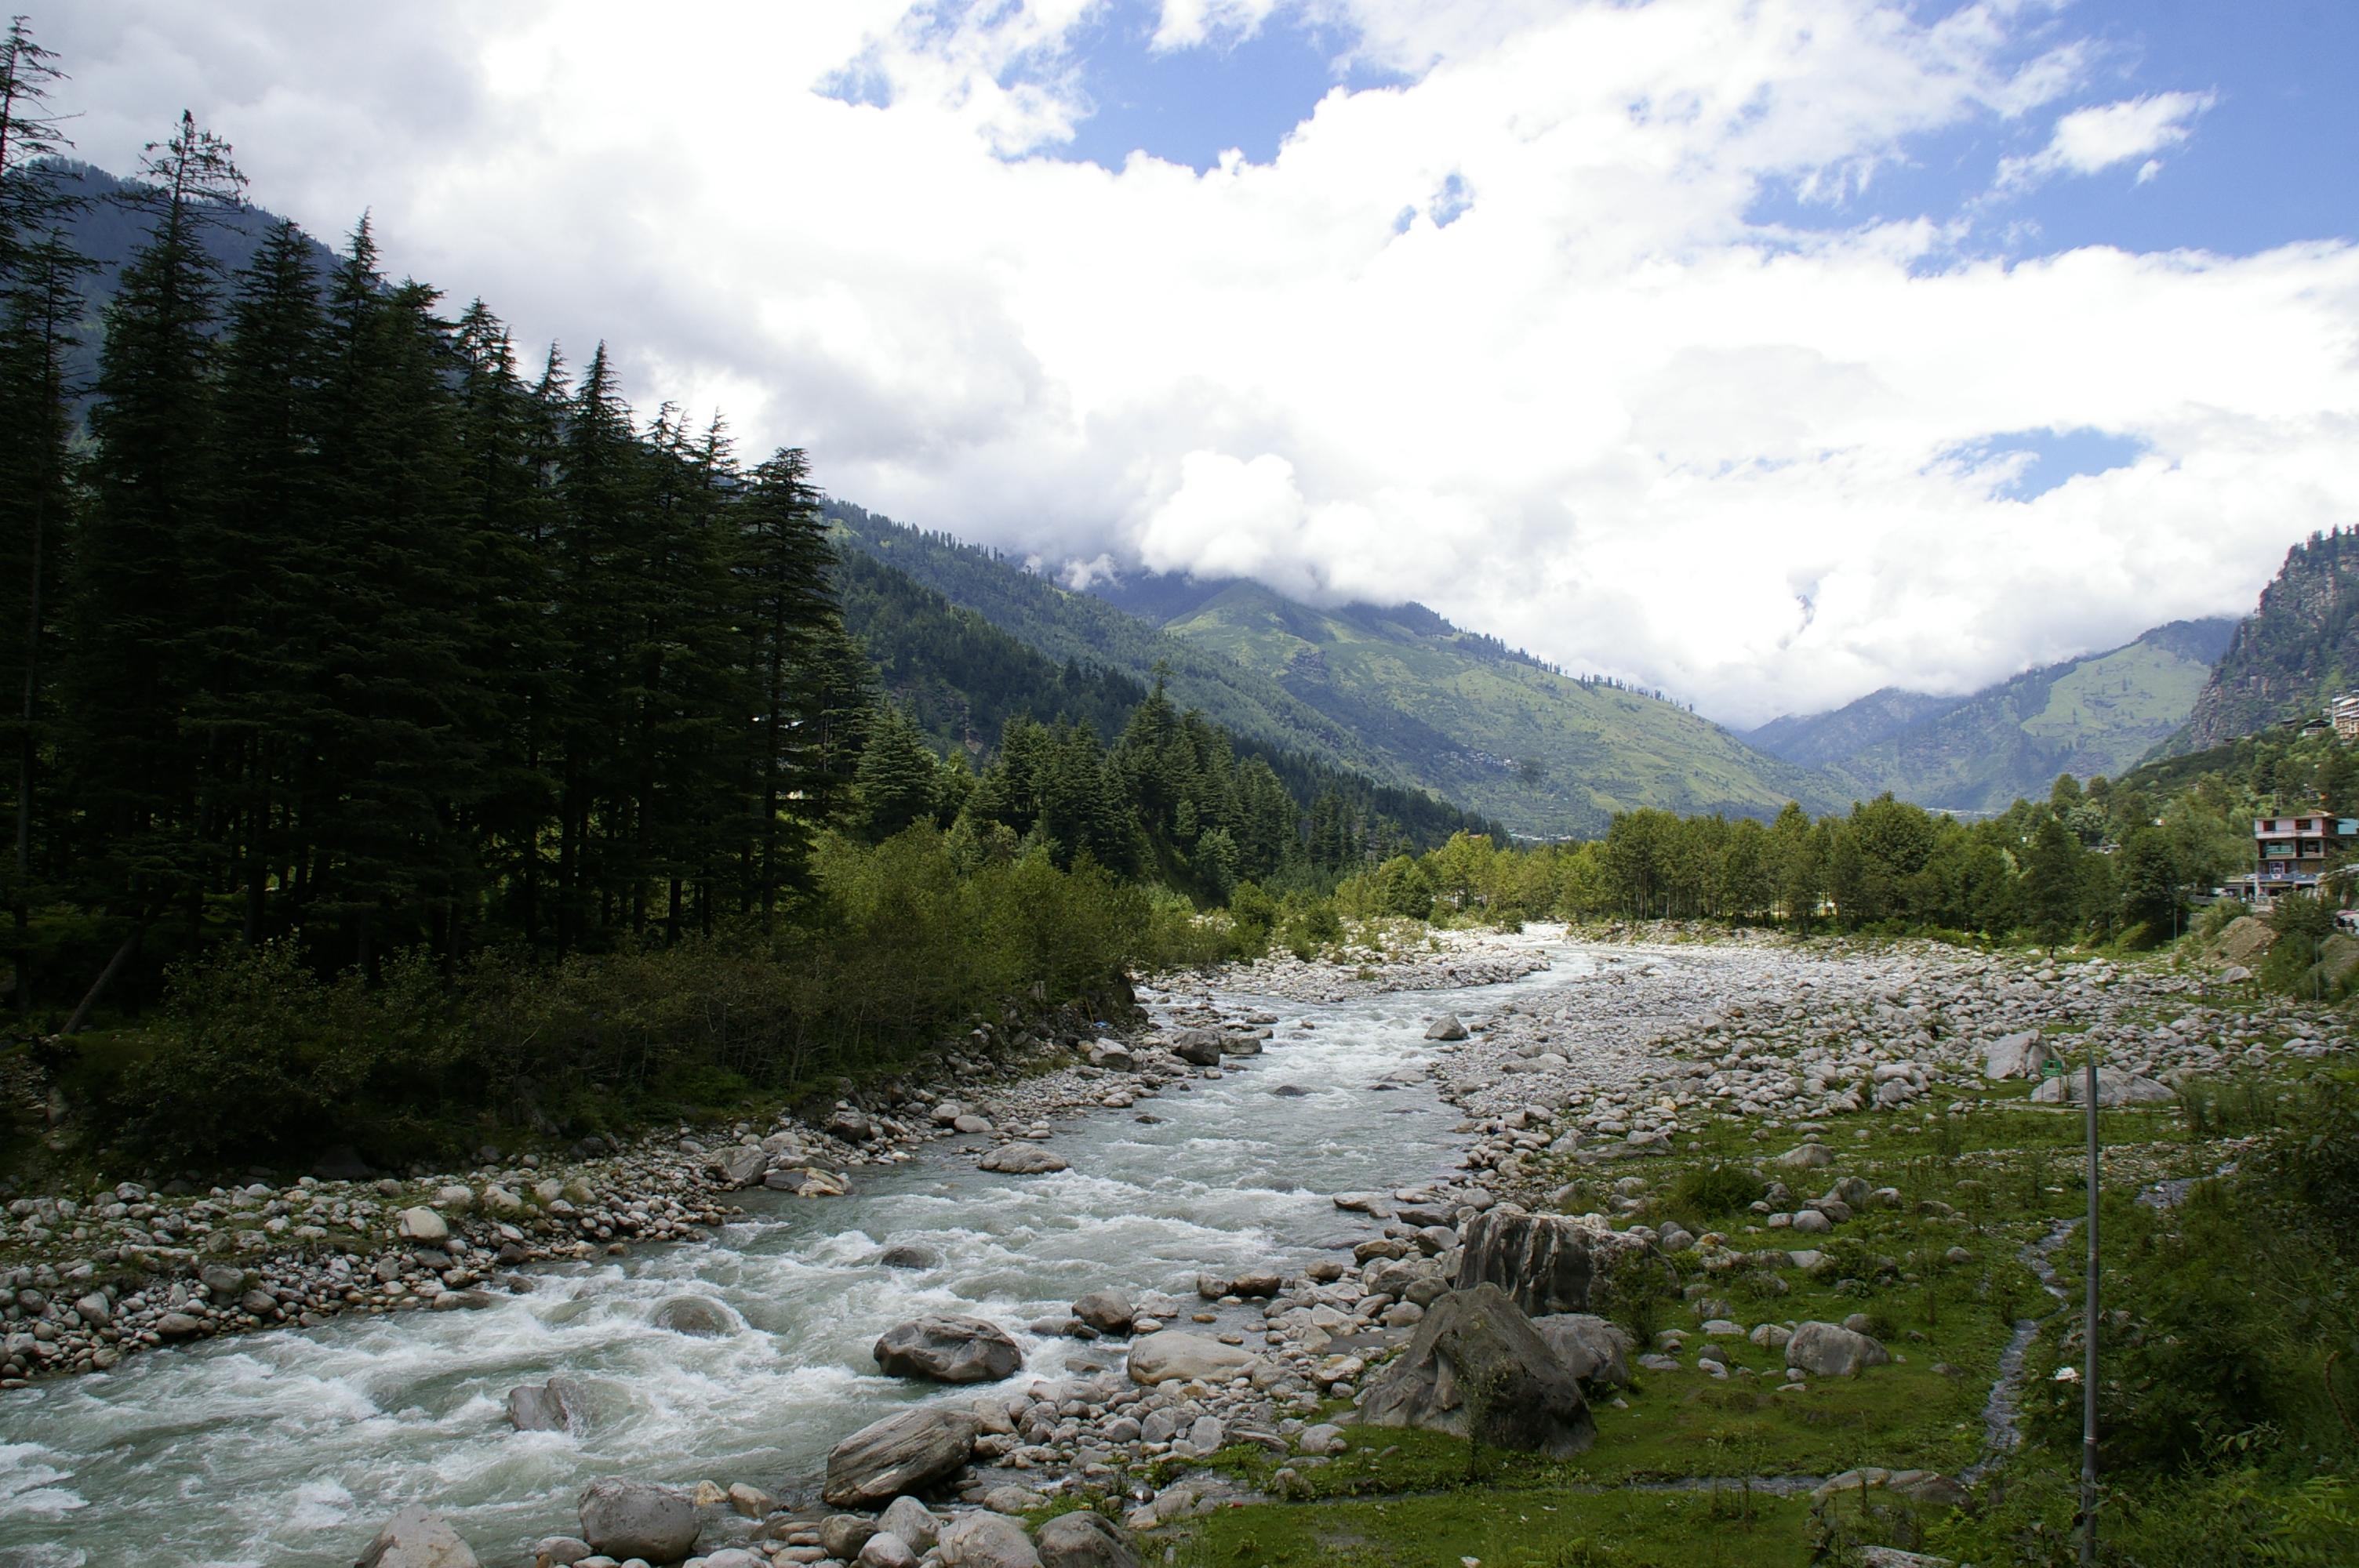 Manali, Himachal Pradesh